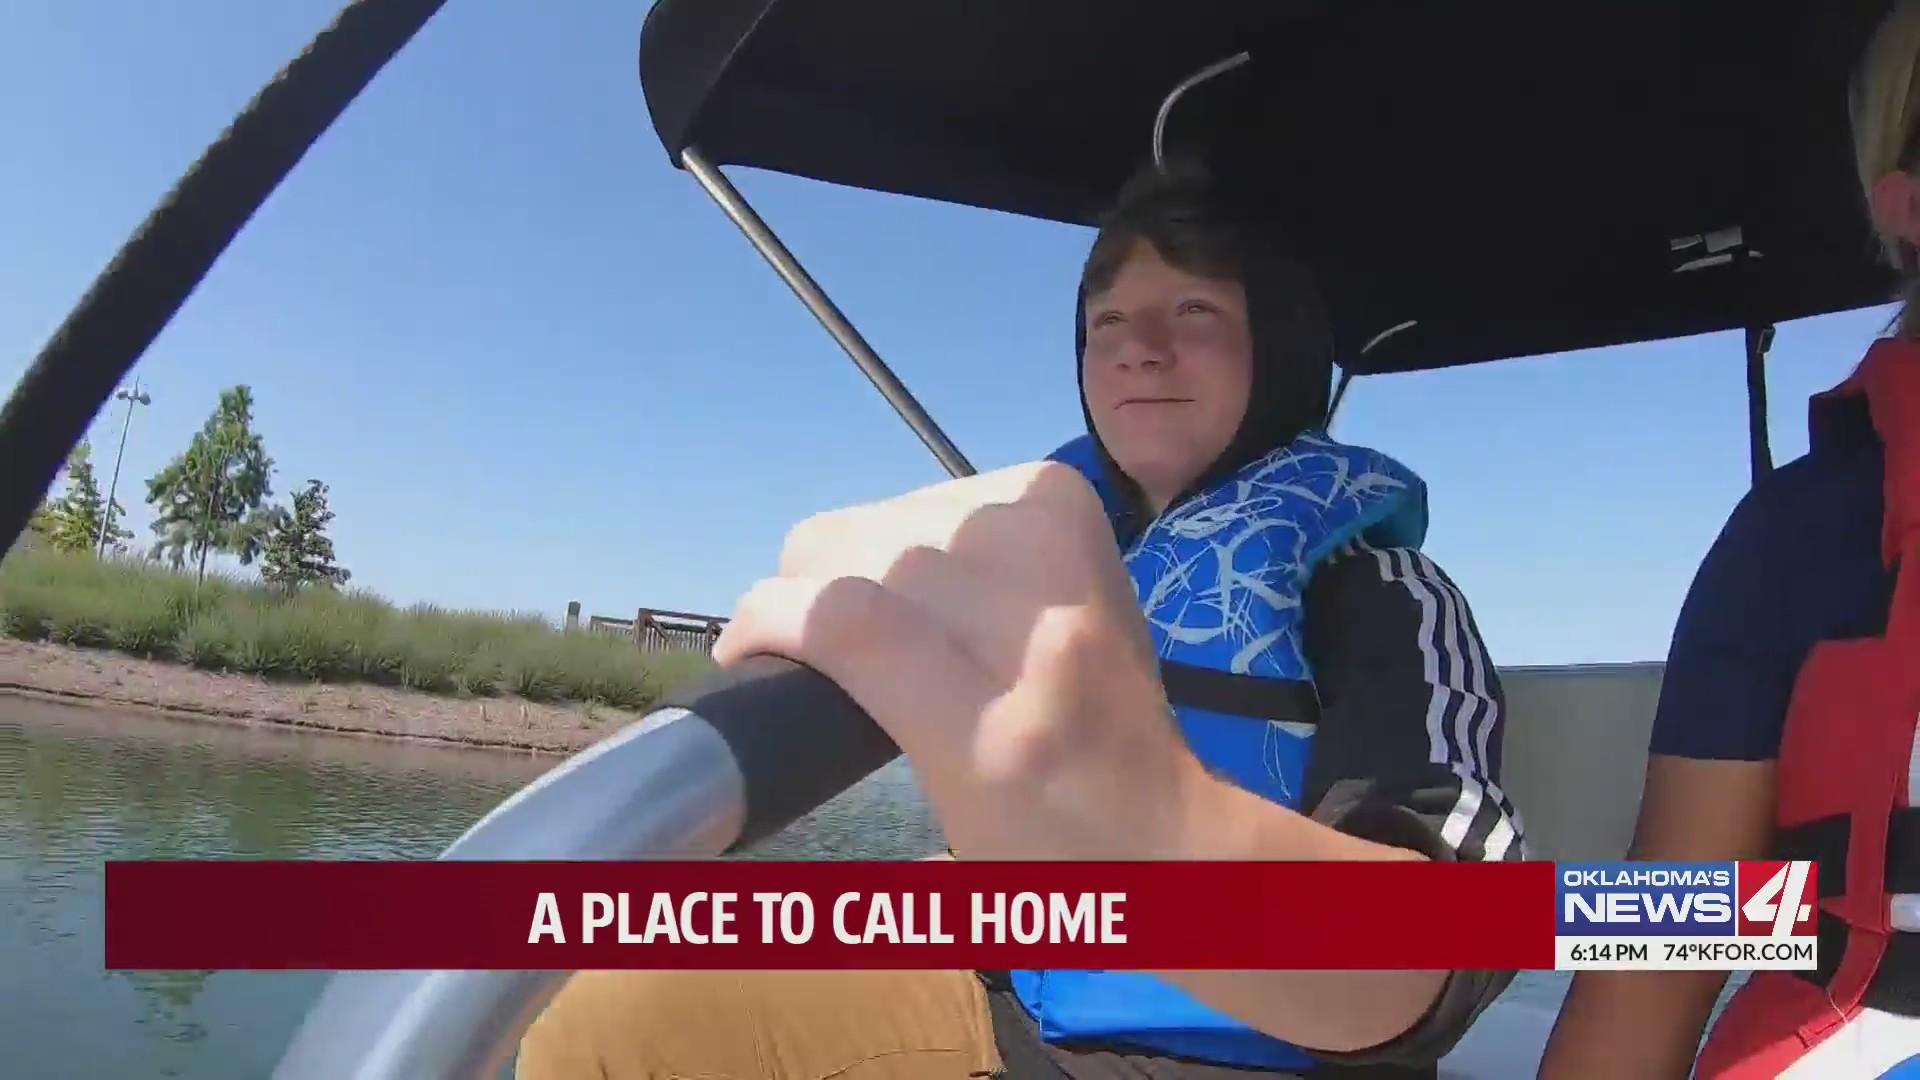 14-year-old Parker navigating paddle boat